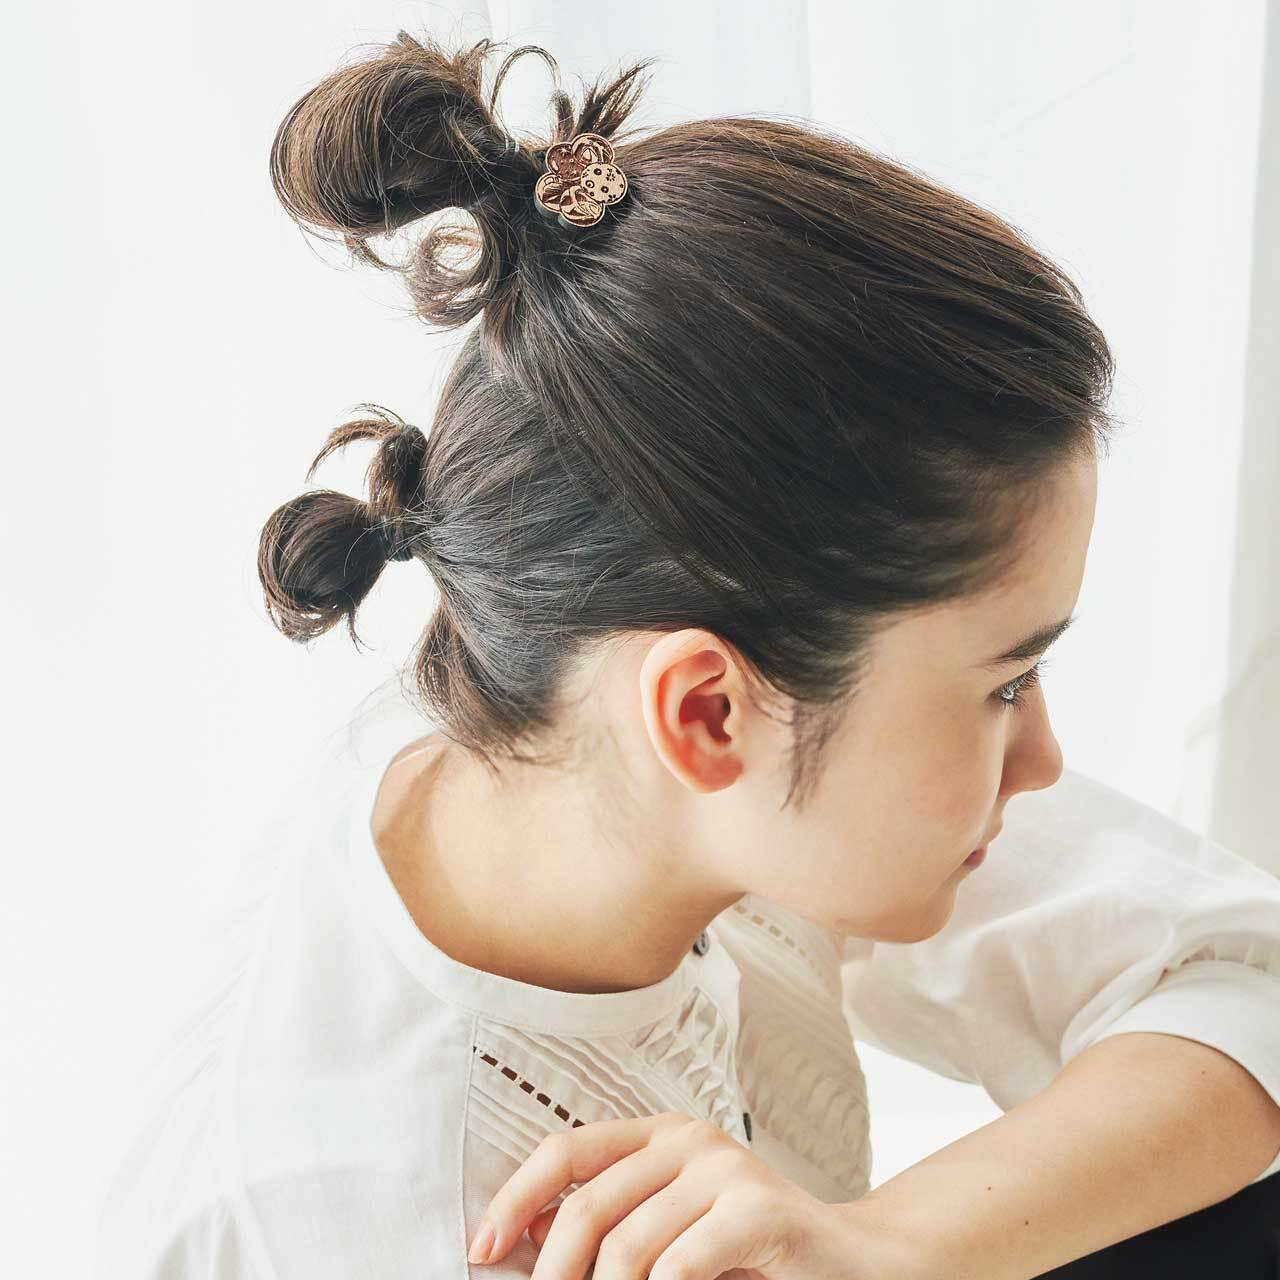 marble / ビー玉(Hair Elastic)/ 黒